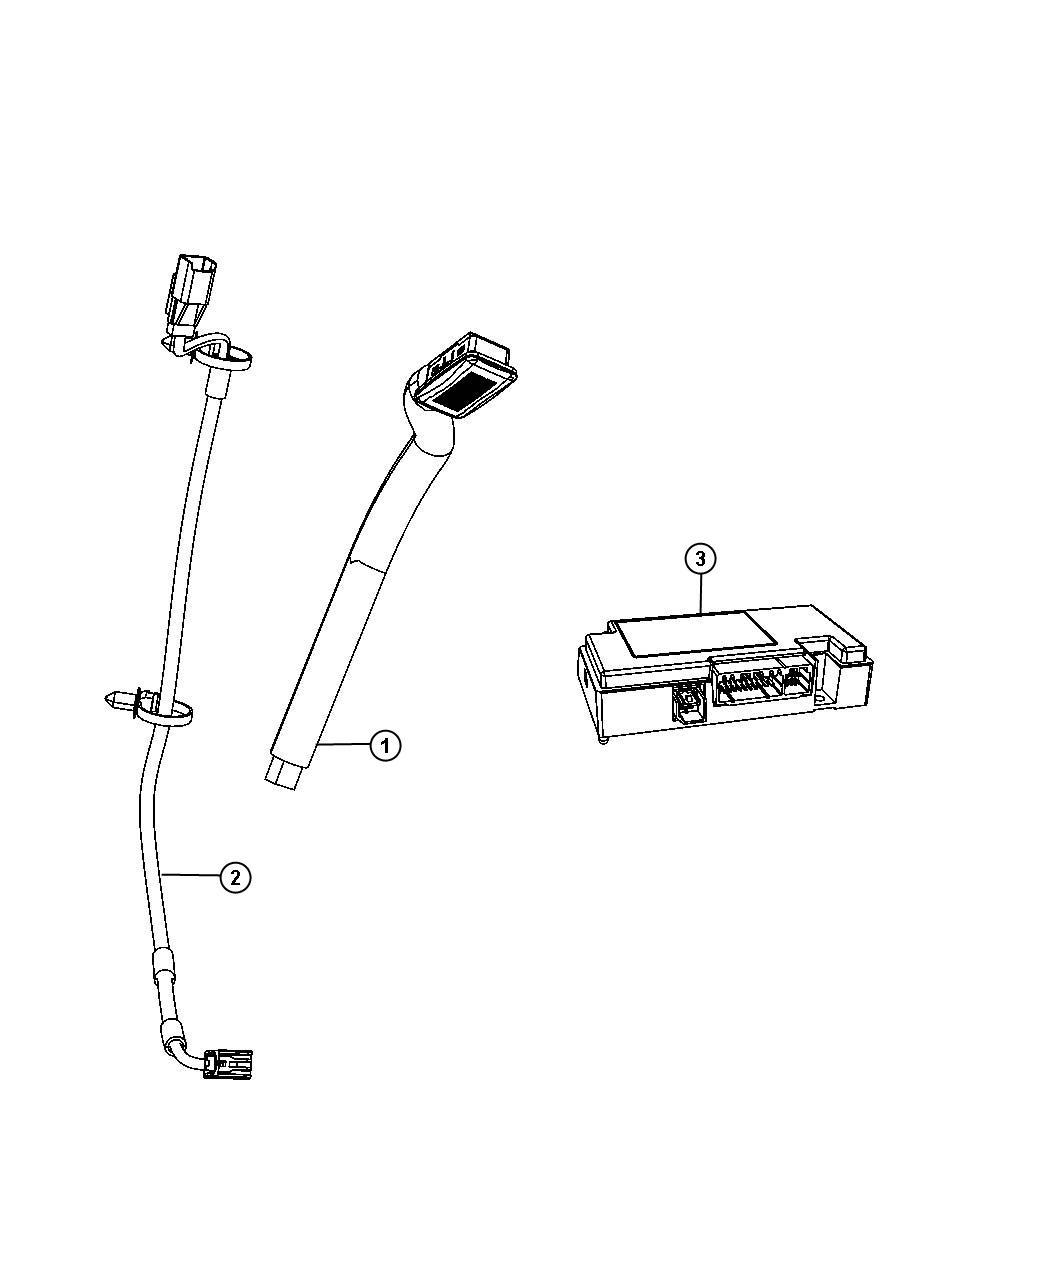 Jeep Wrangler Wiring. Jumper. Instrument panel